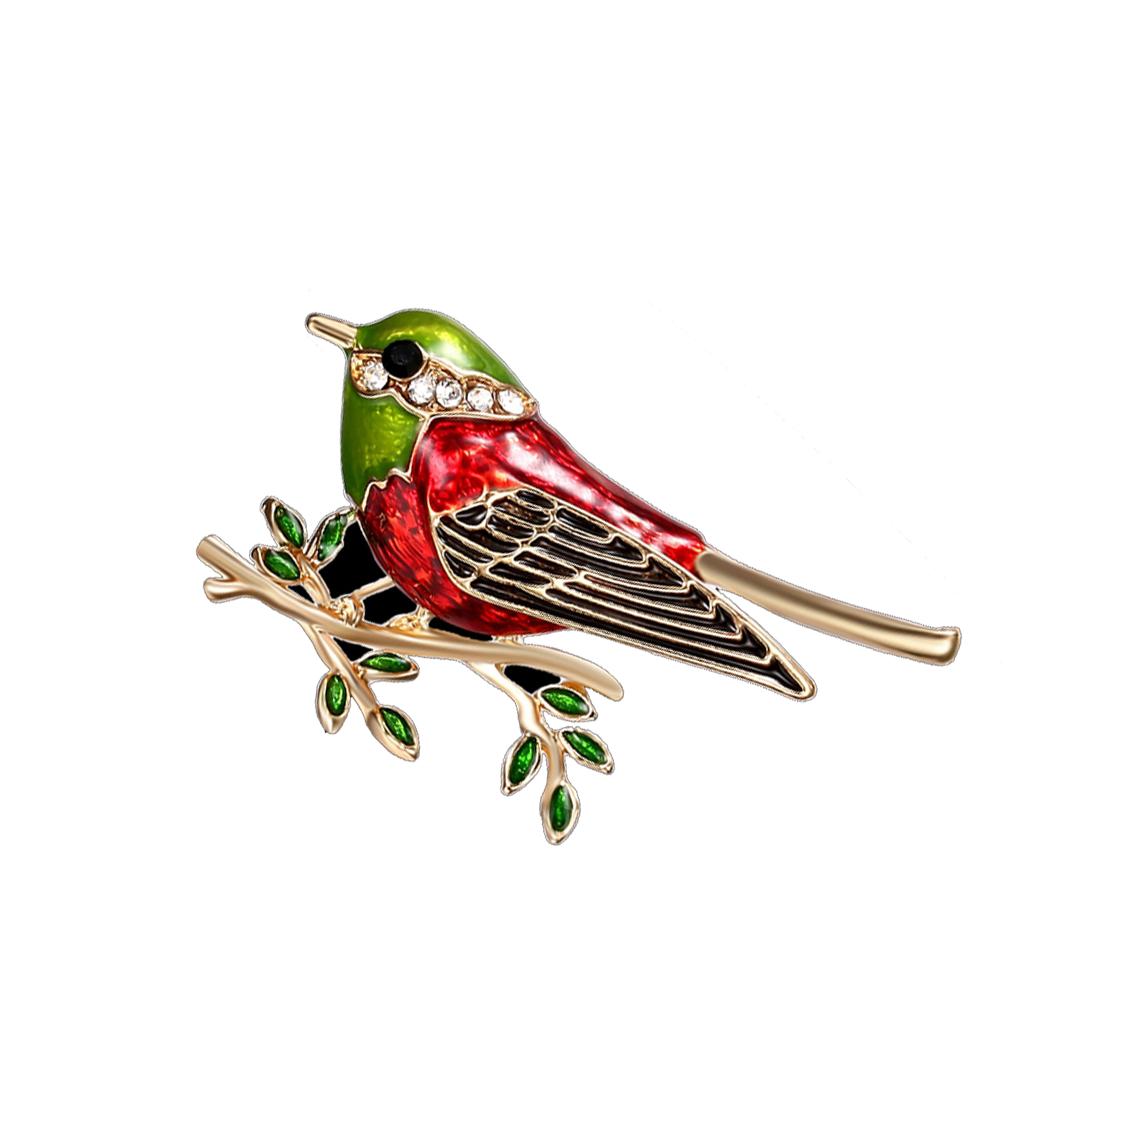 Green Oriole Bird Brooch